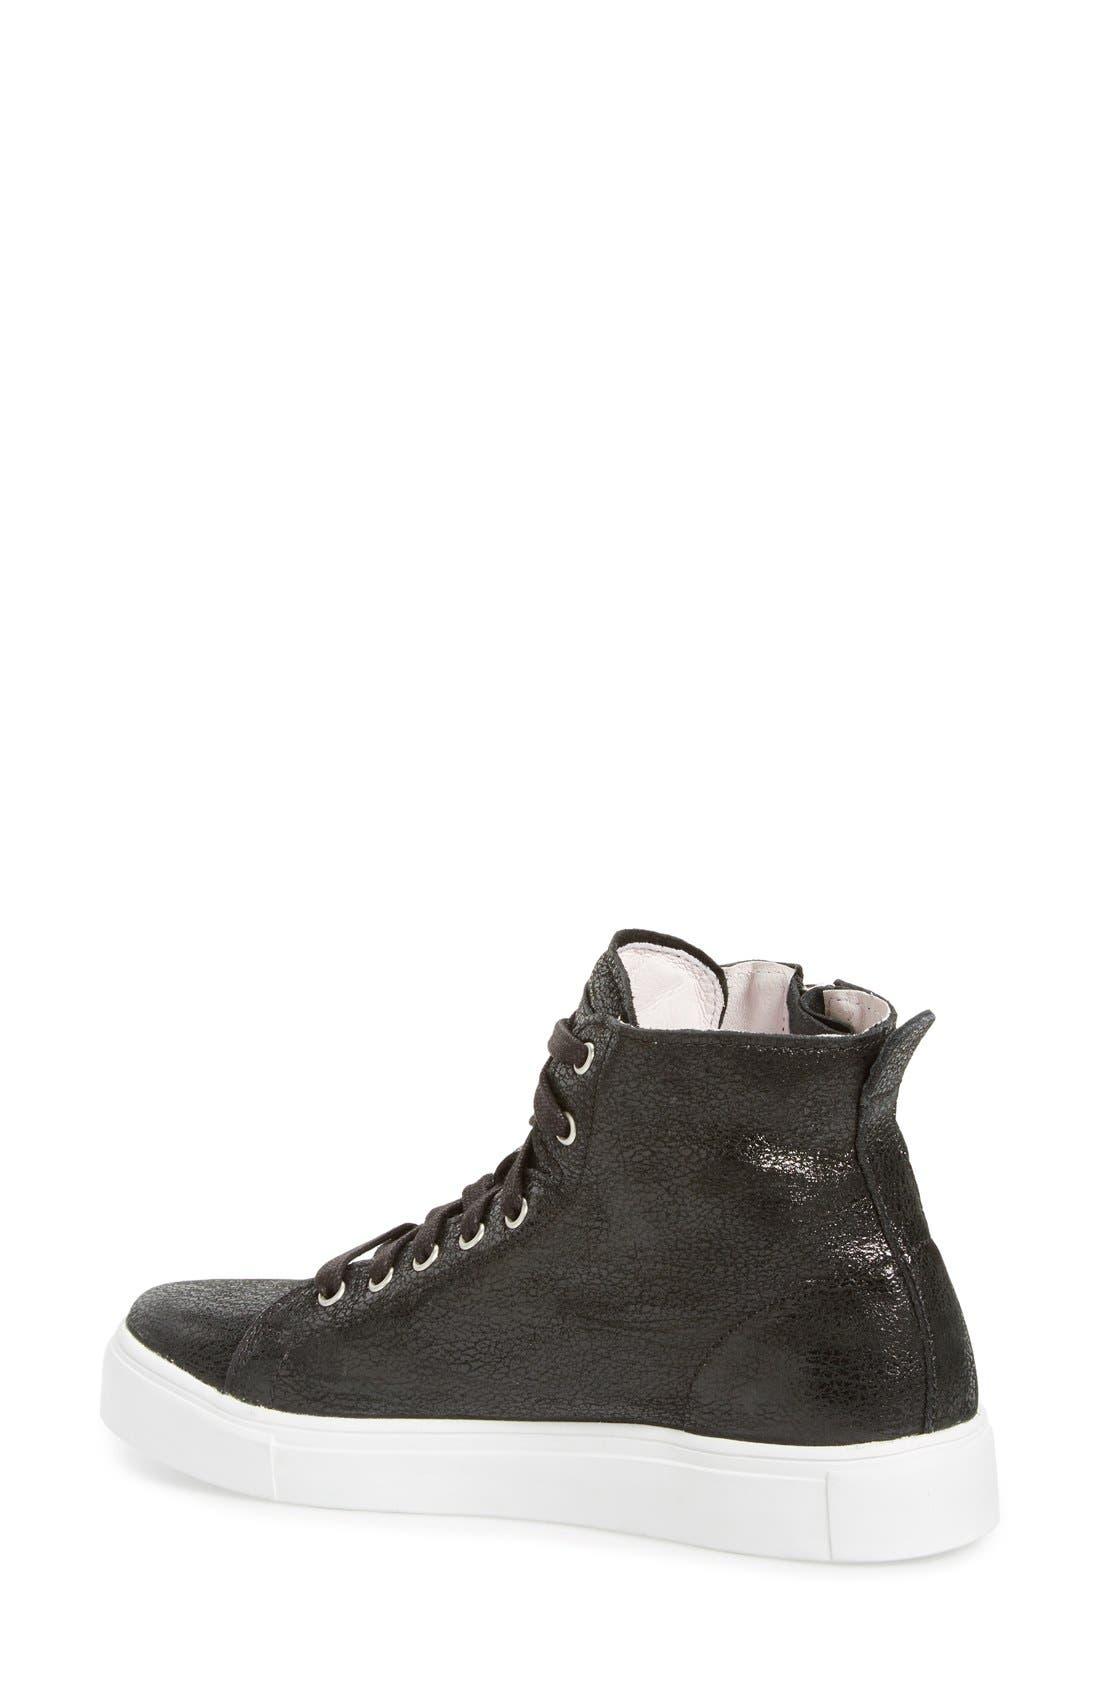 Alternate Image 2  - Blackstone 'LL65' High Top Sneaker (Women)